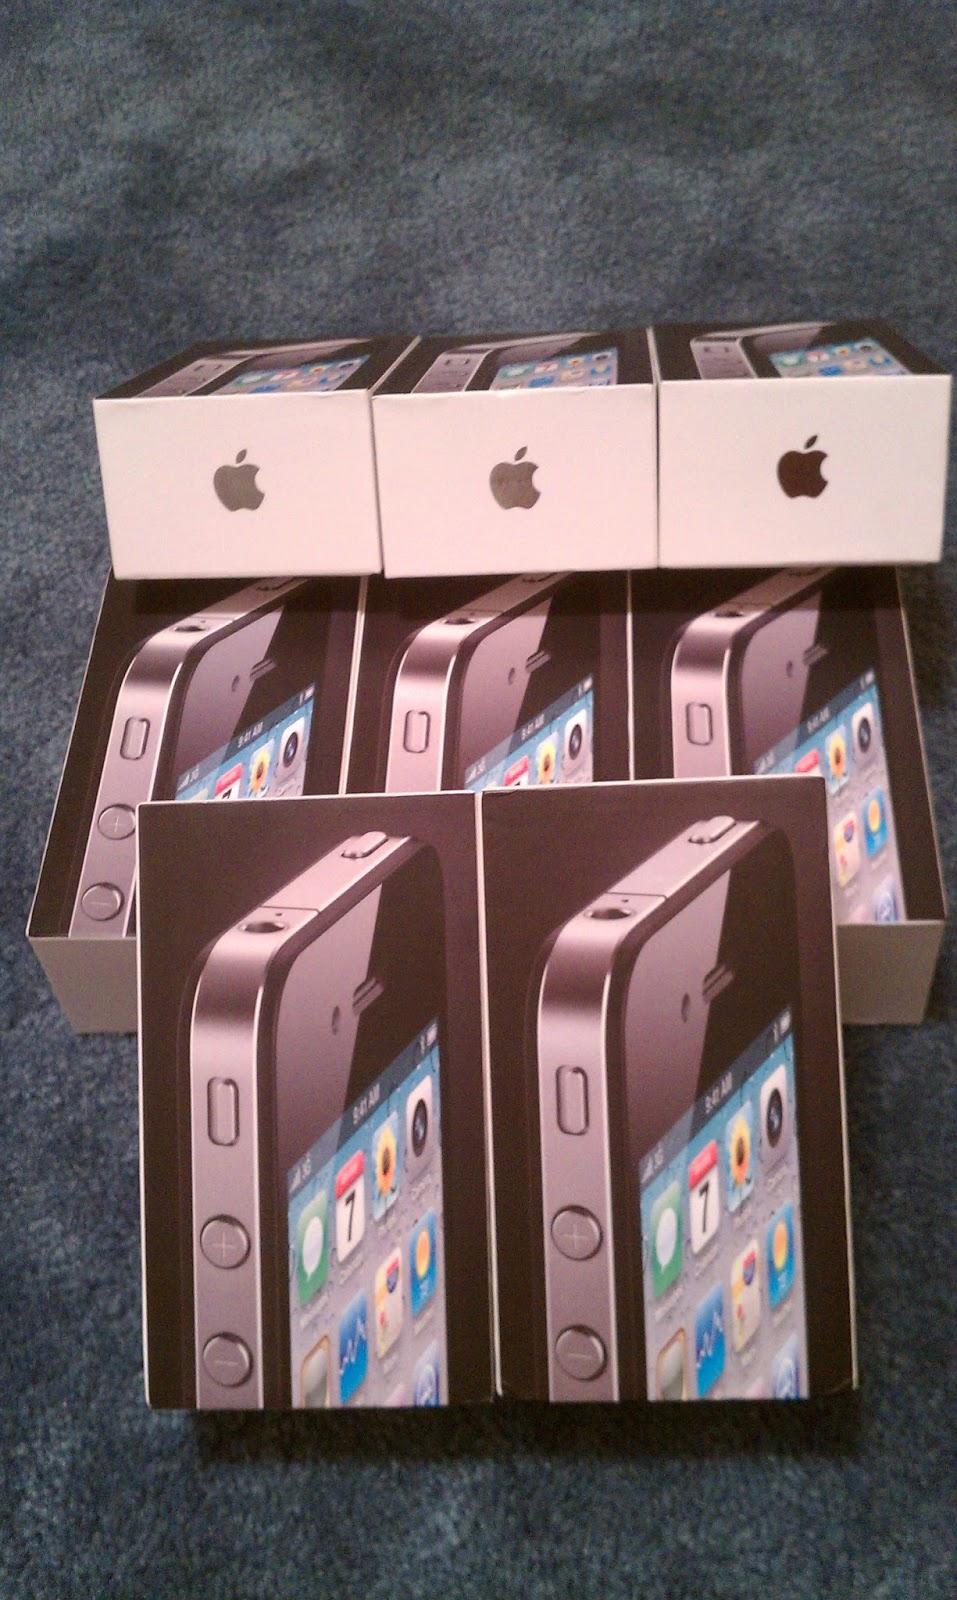 MidwestGSM legitimate, Apple iPhone, testimonial,